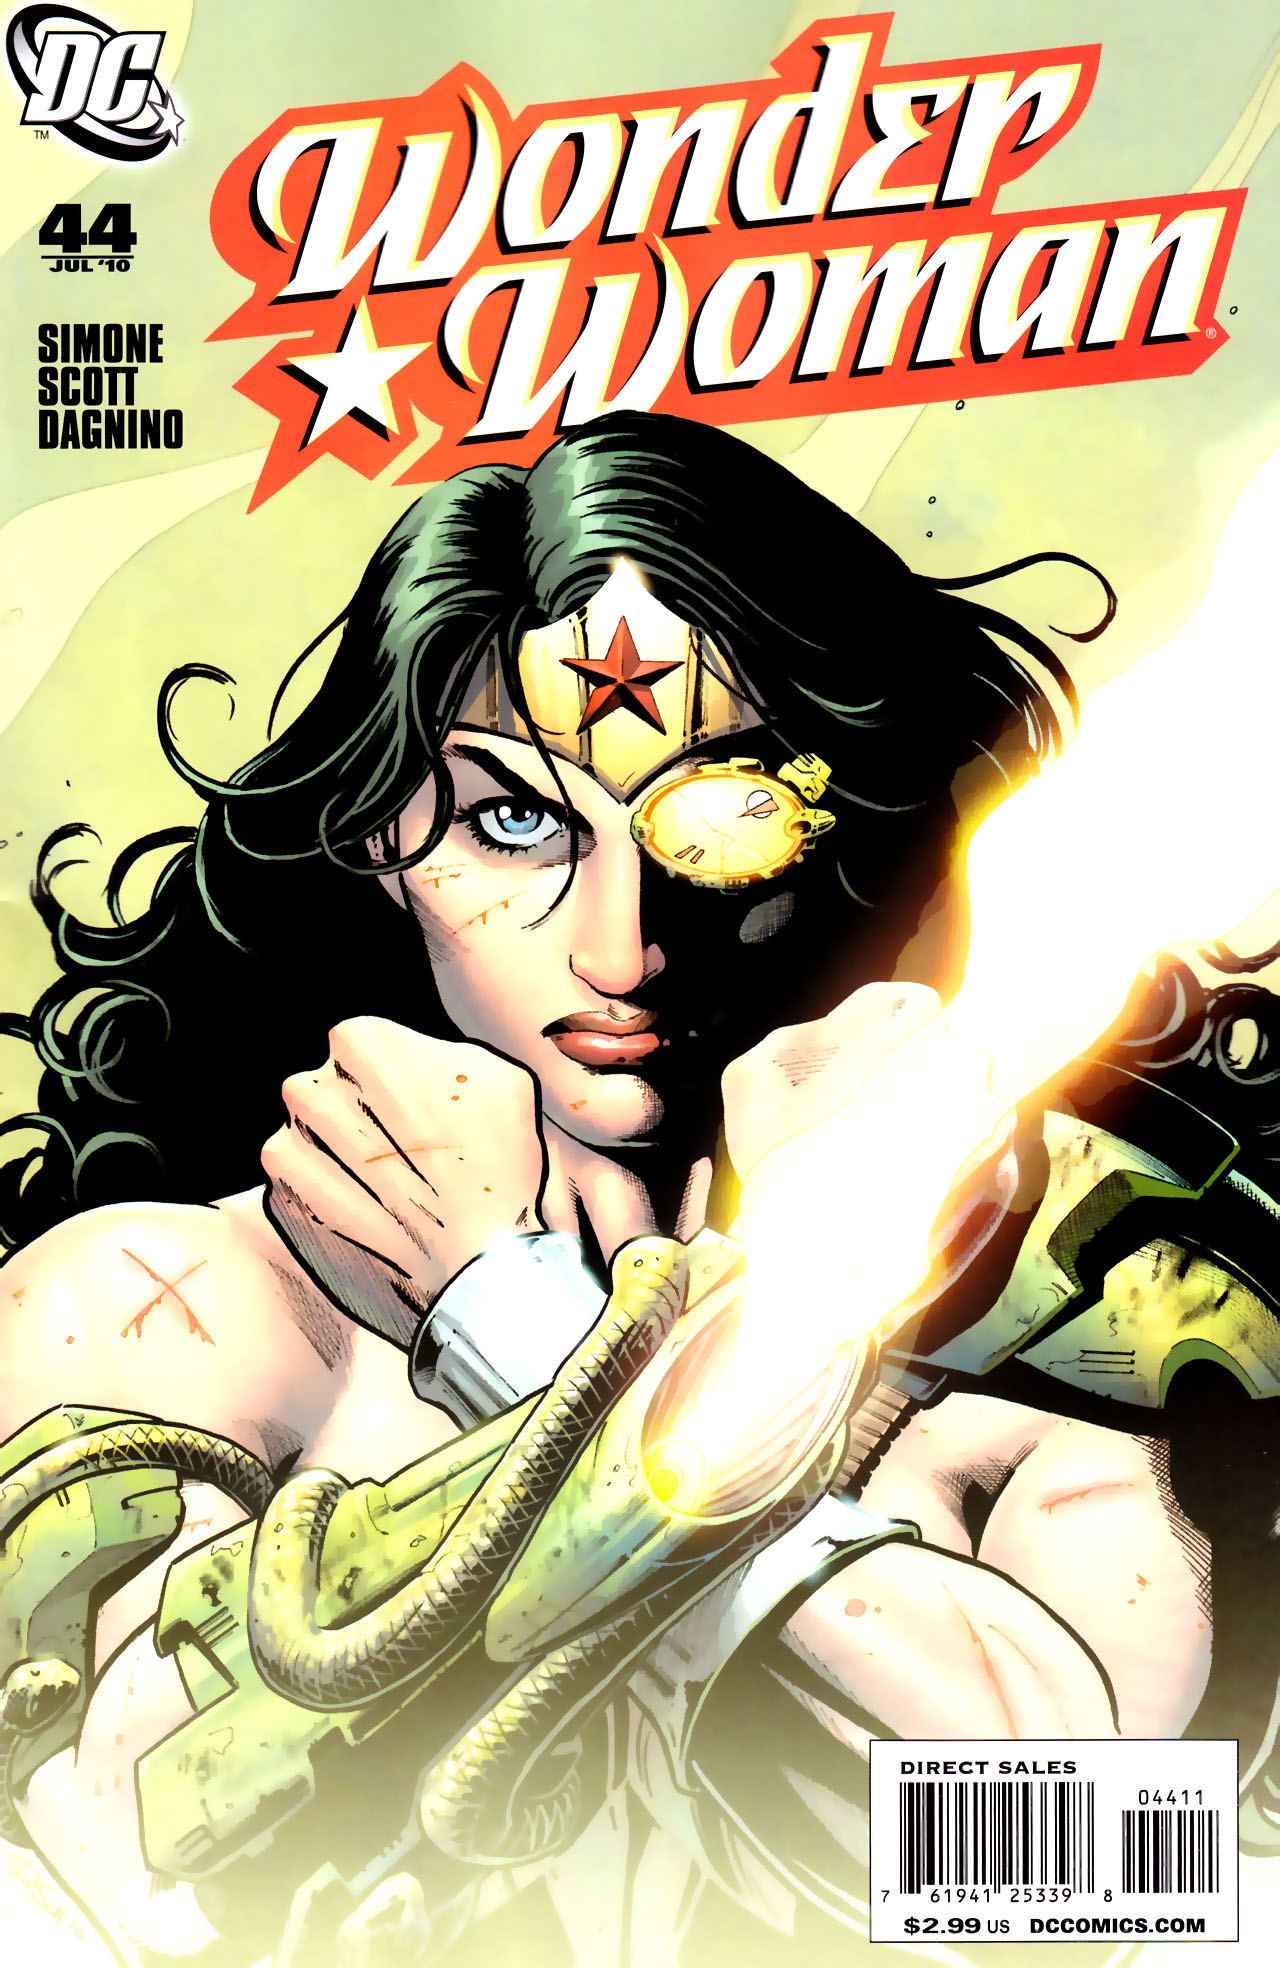 Read online Wonder Woman (2006) comic -  Issue #44 - 1